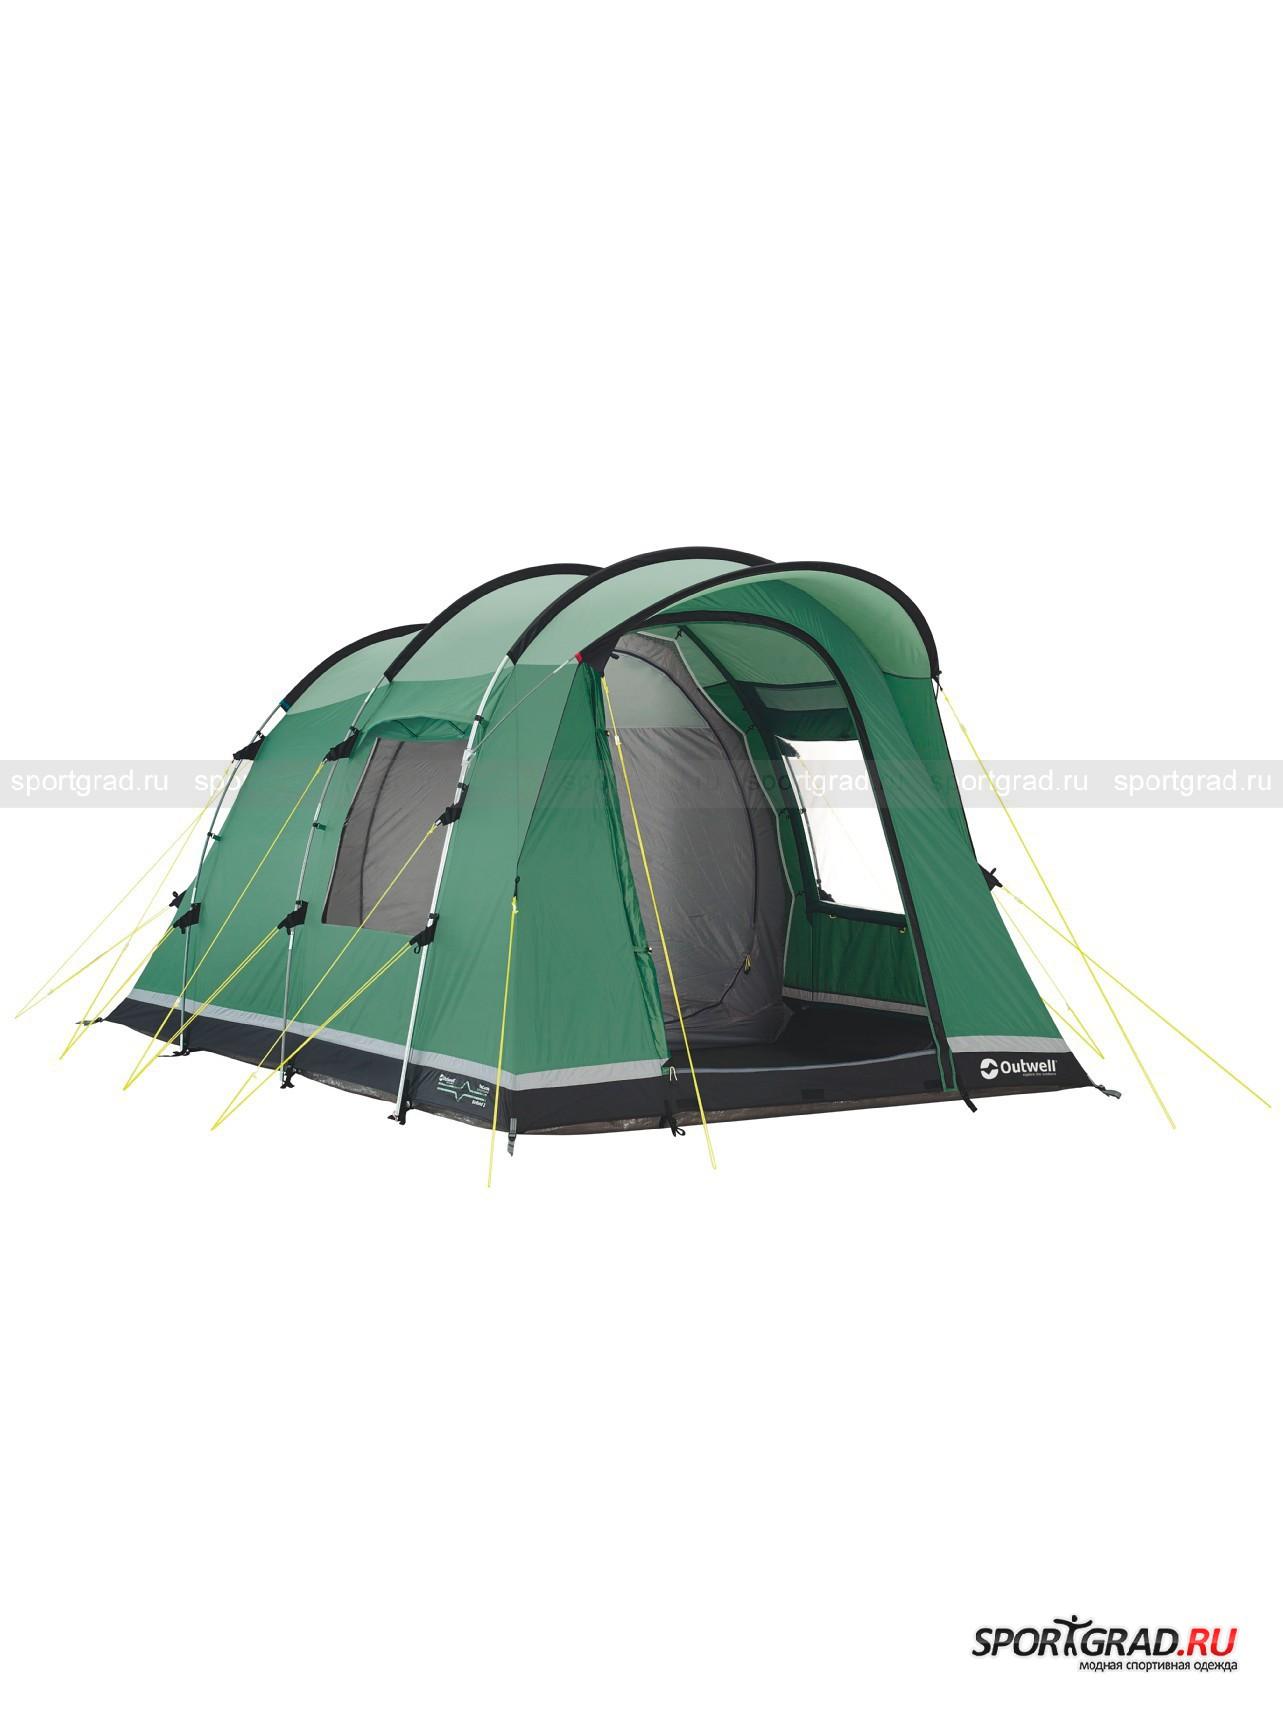 Палатка трёхместная Birdland S Outwell